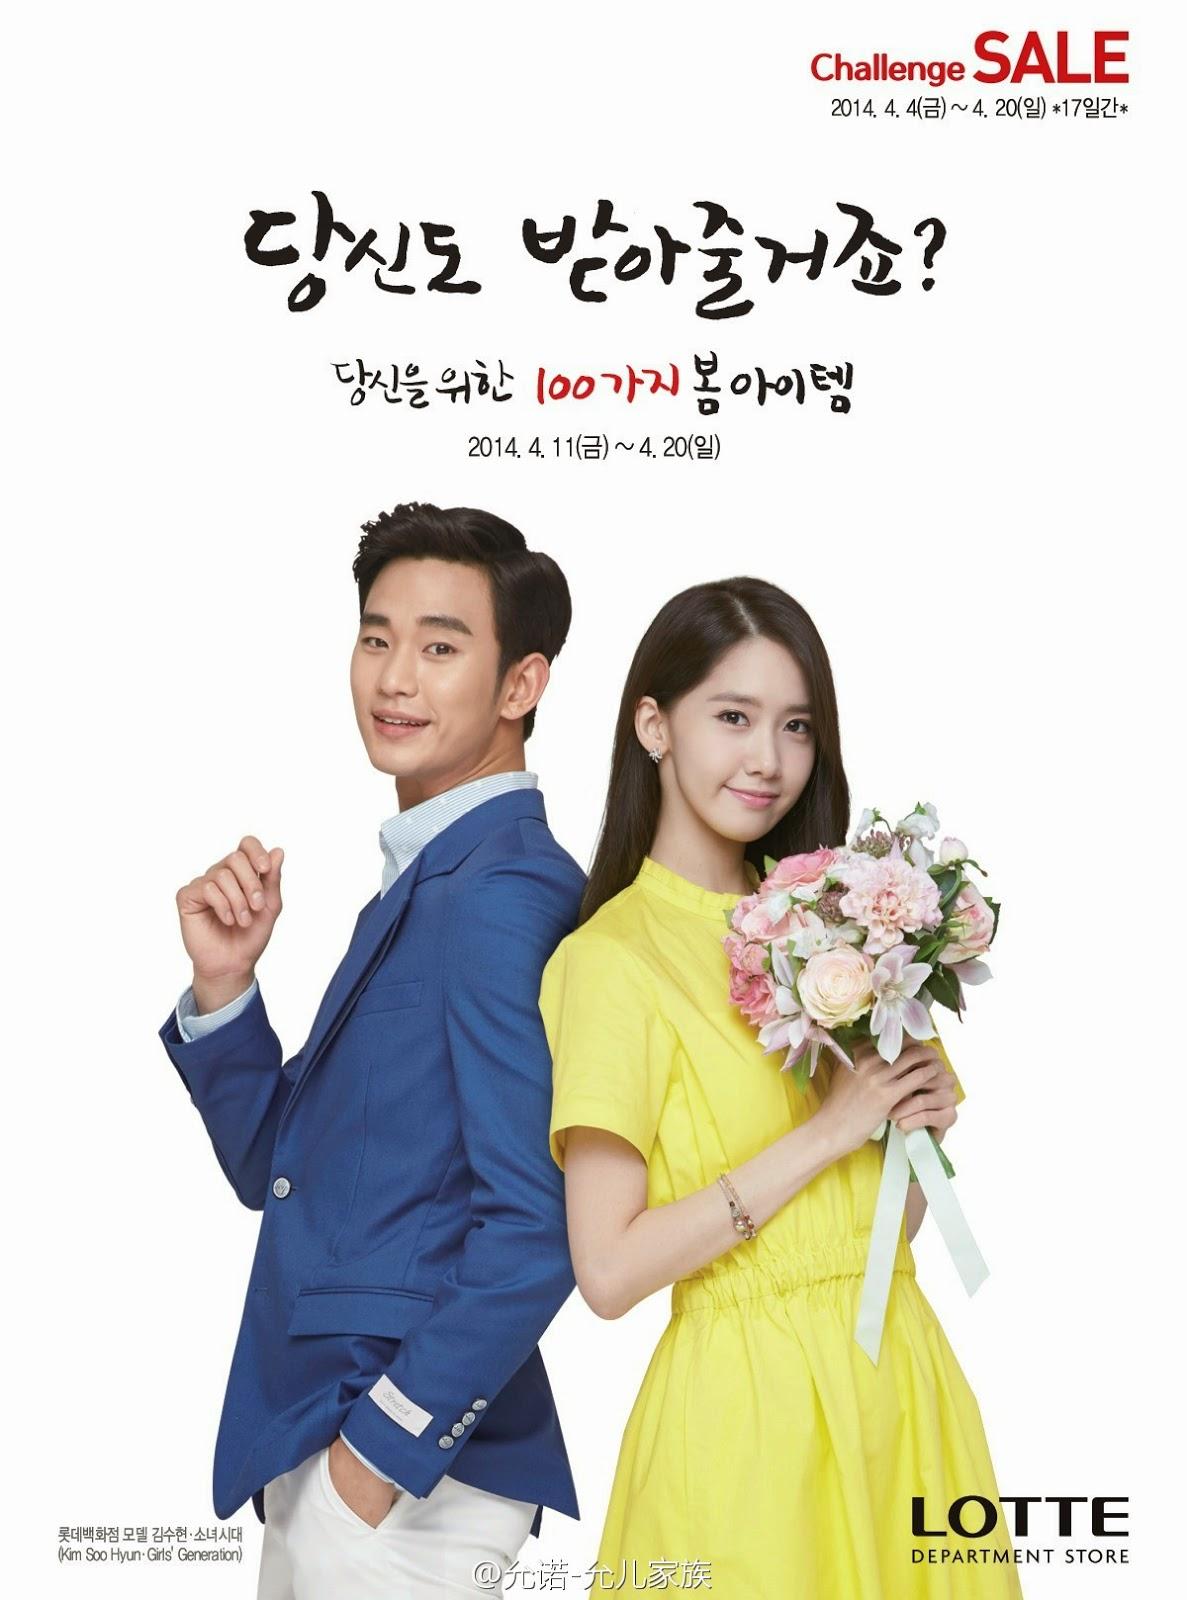 Yoona and kim soo hyun dating rumors